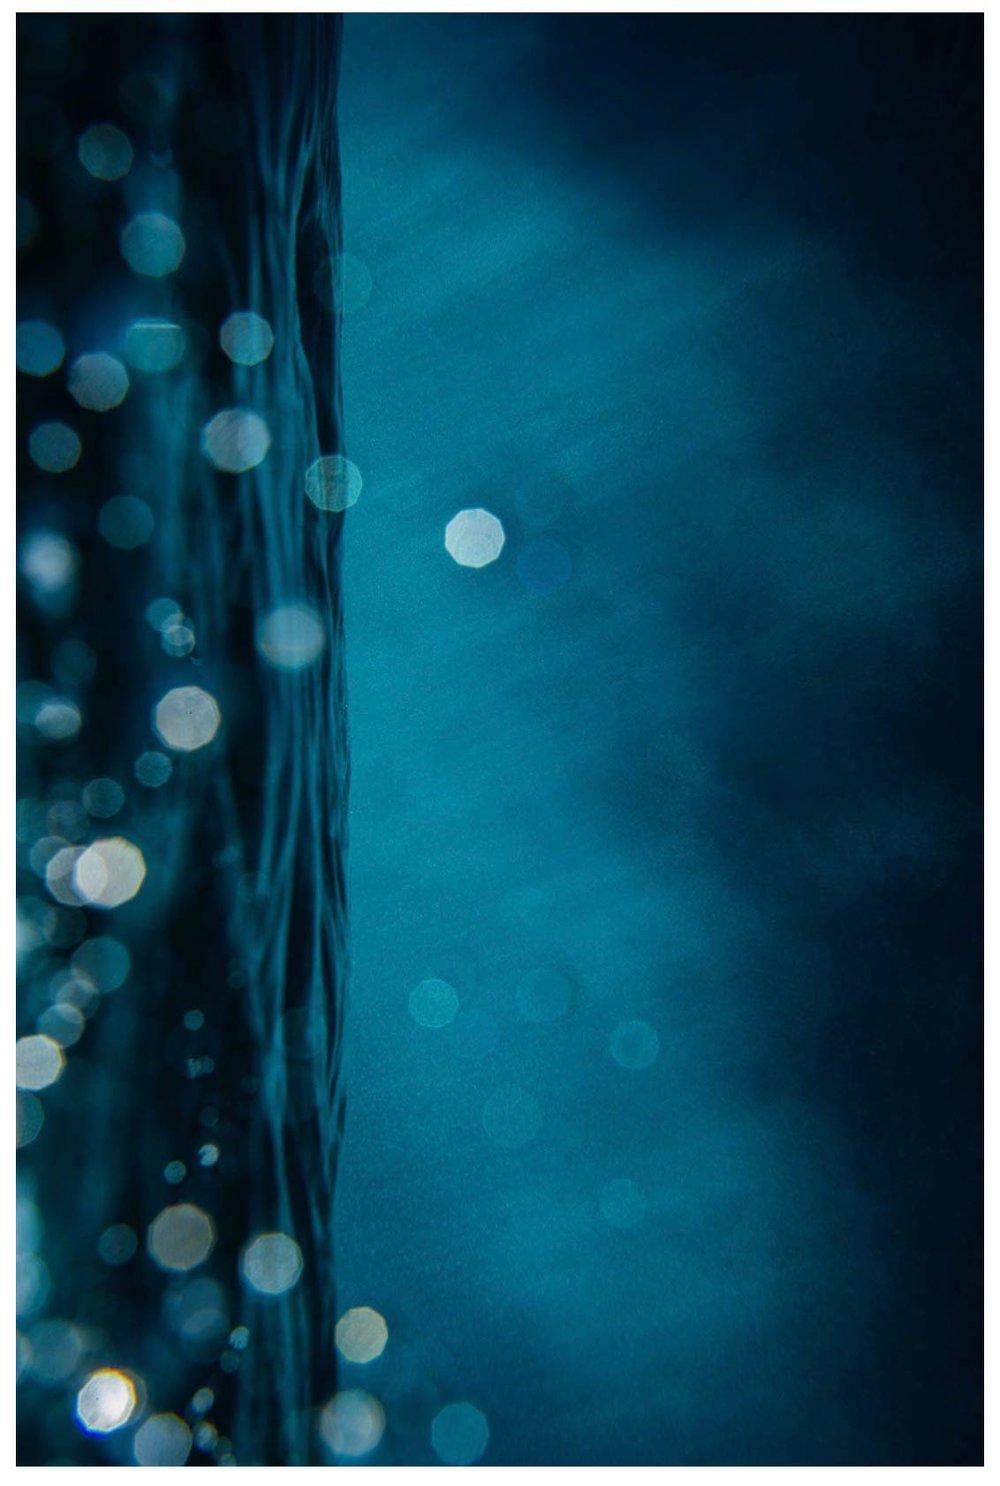 rodd-owen-ocean-surf-photography-for-sale-122.jpg